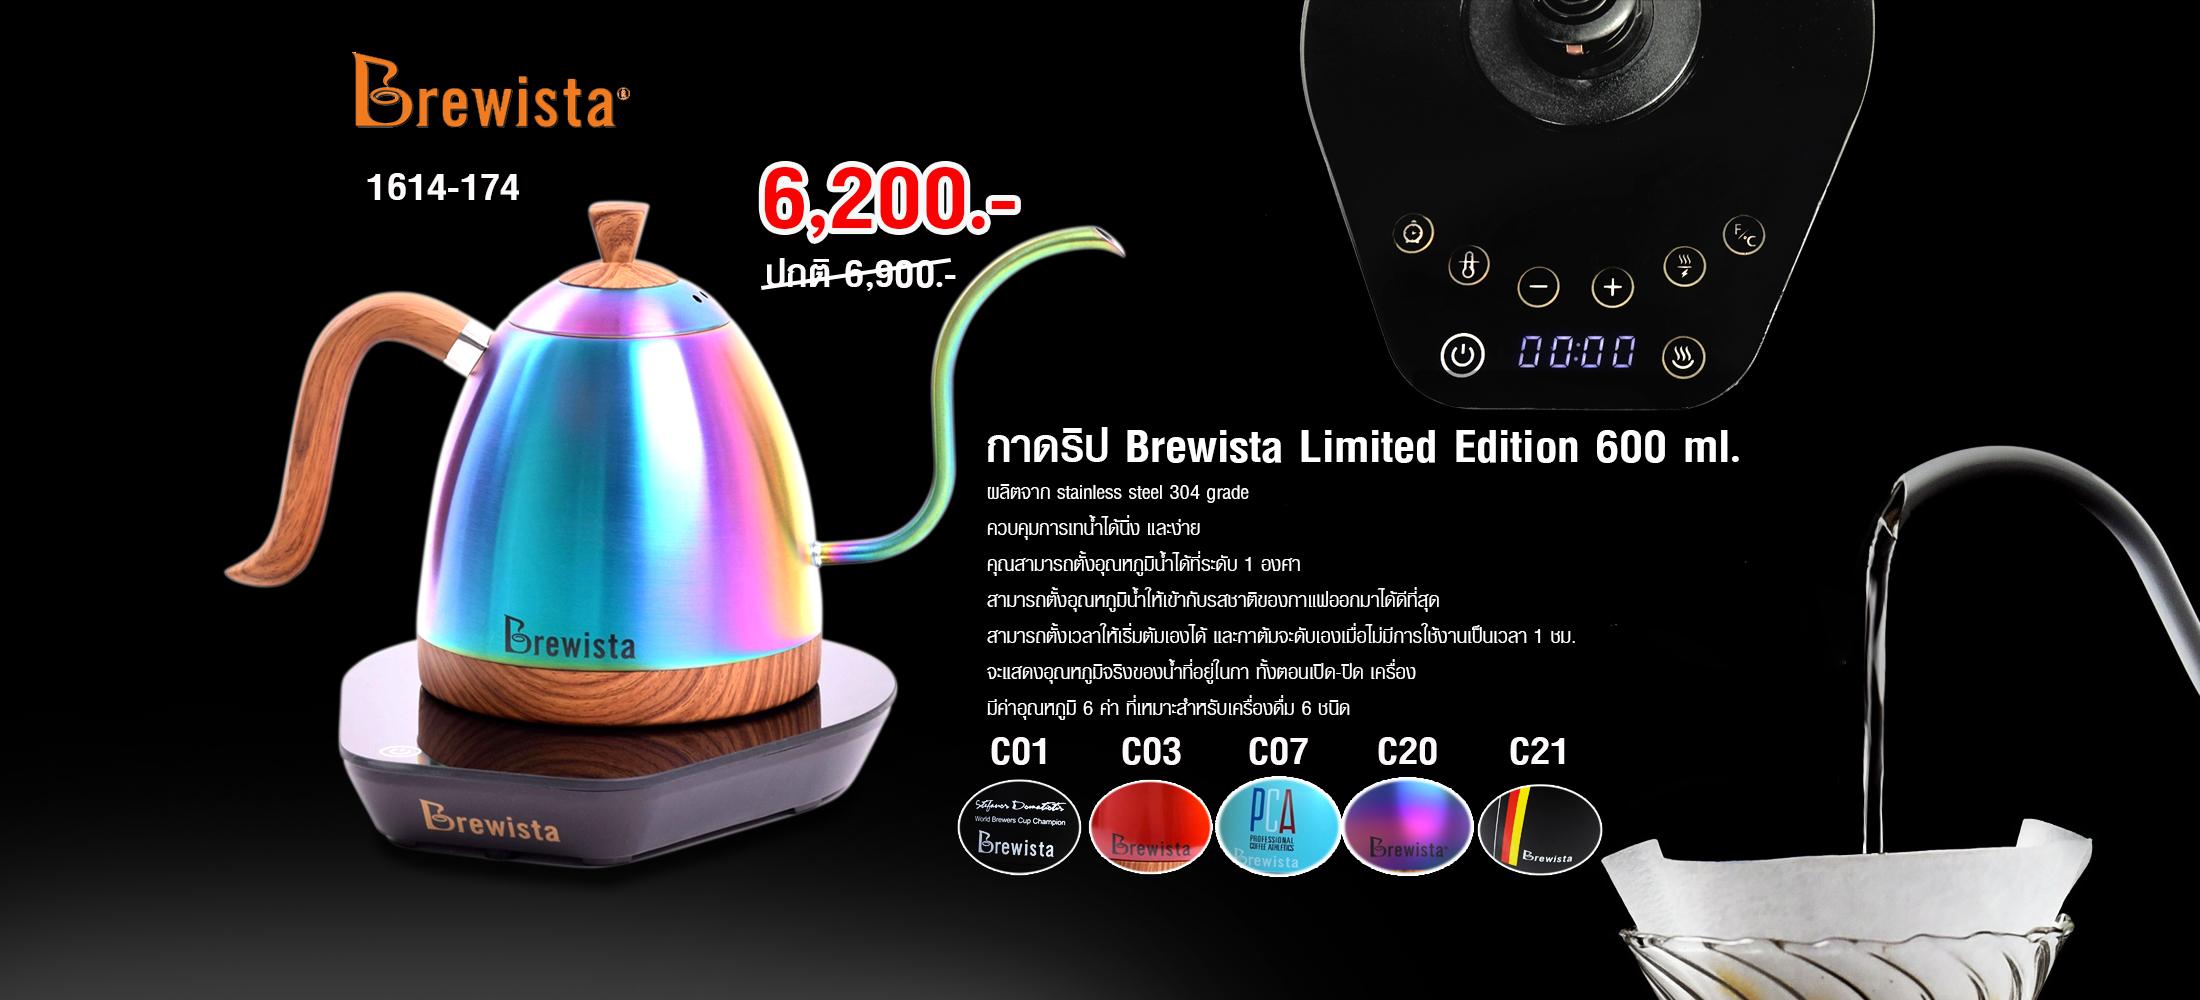 Brewista กาคอห่าน อุปกรณ์ทำกาแฟดริป